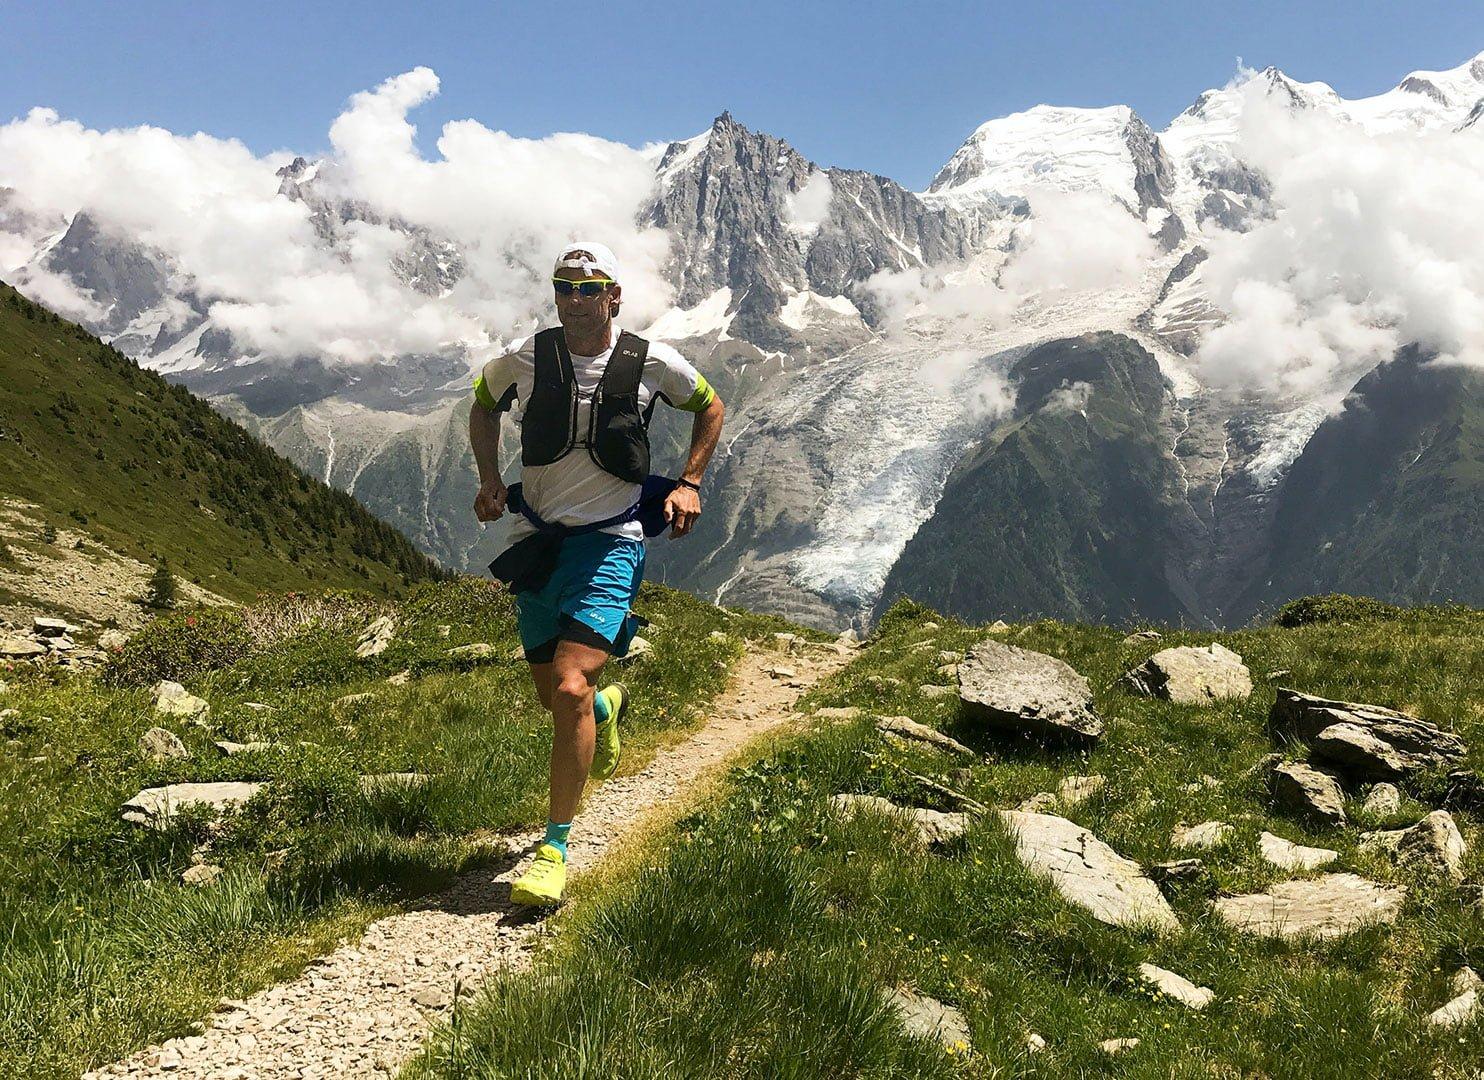 Man Running and Hiking